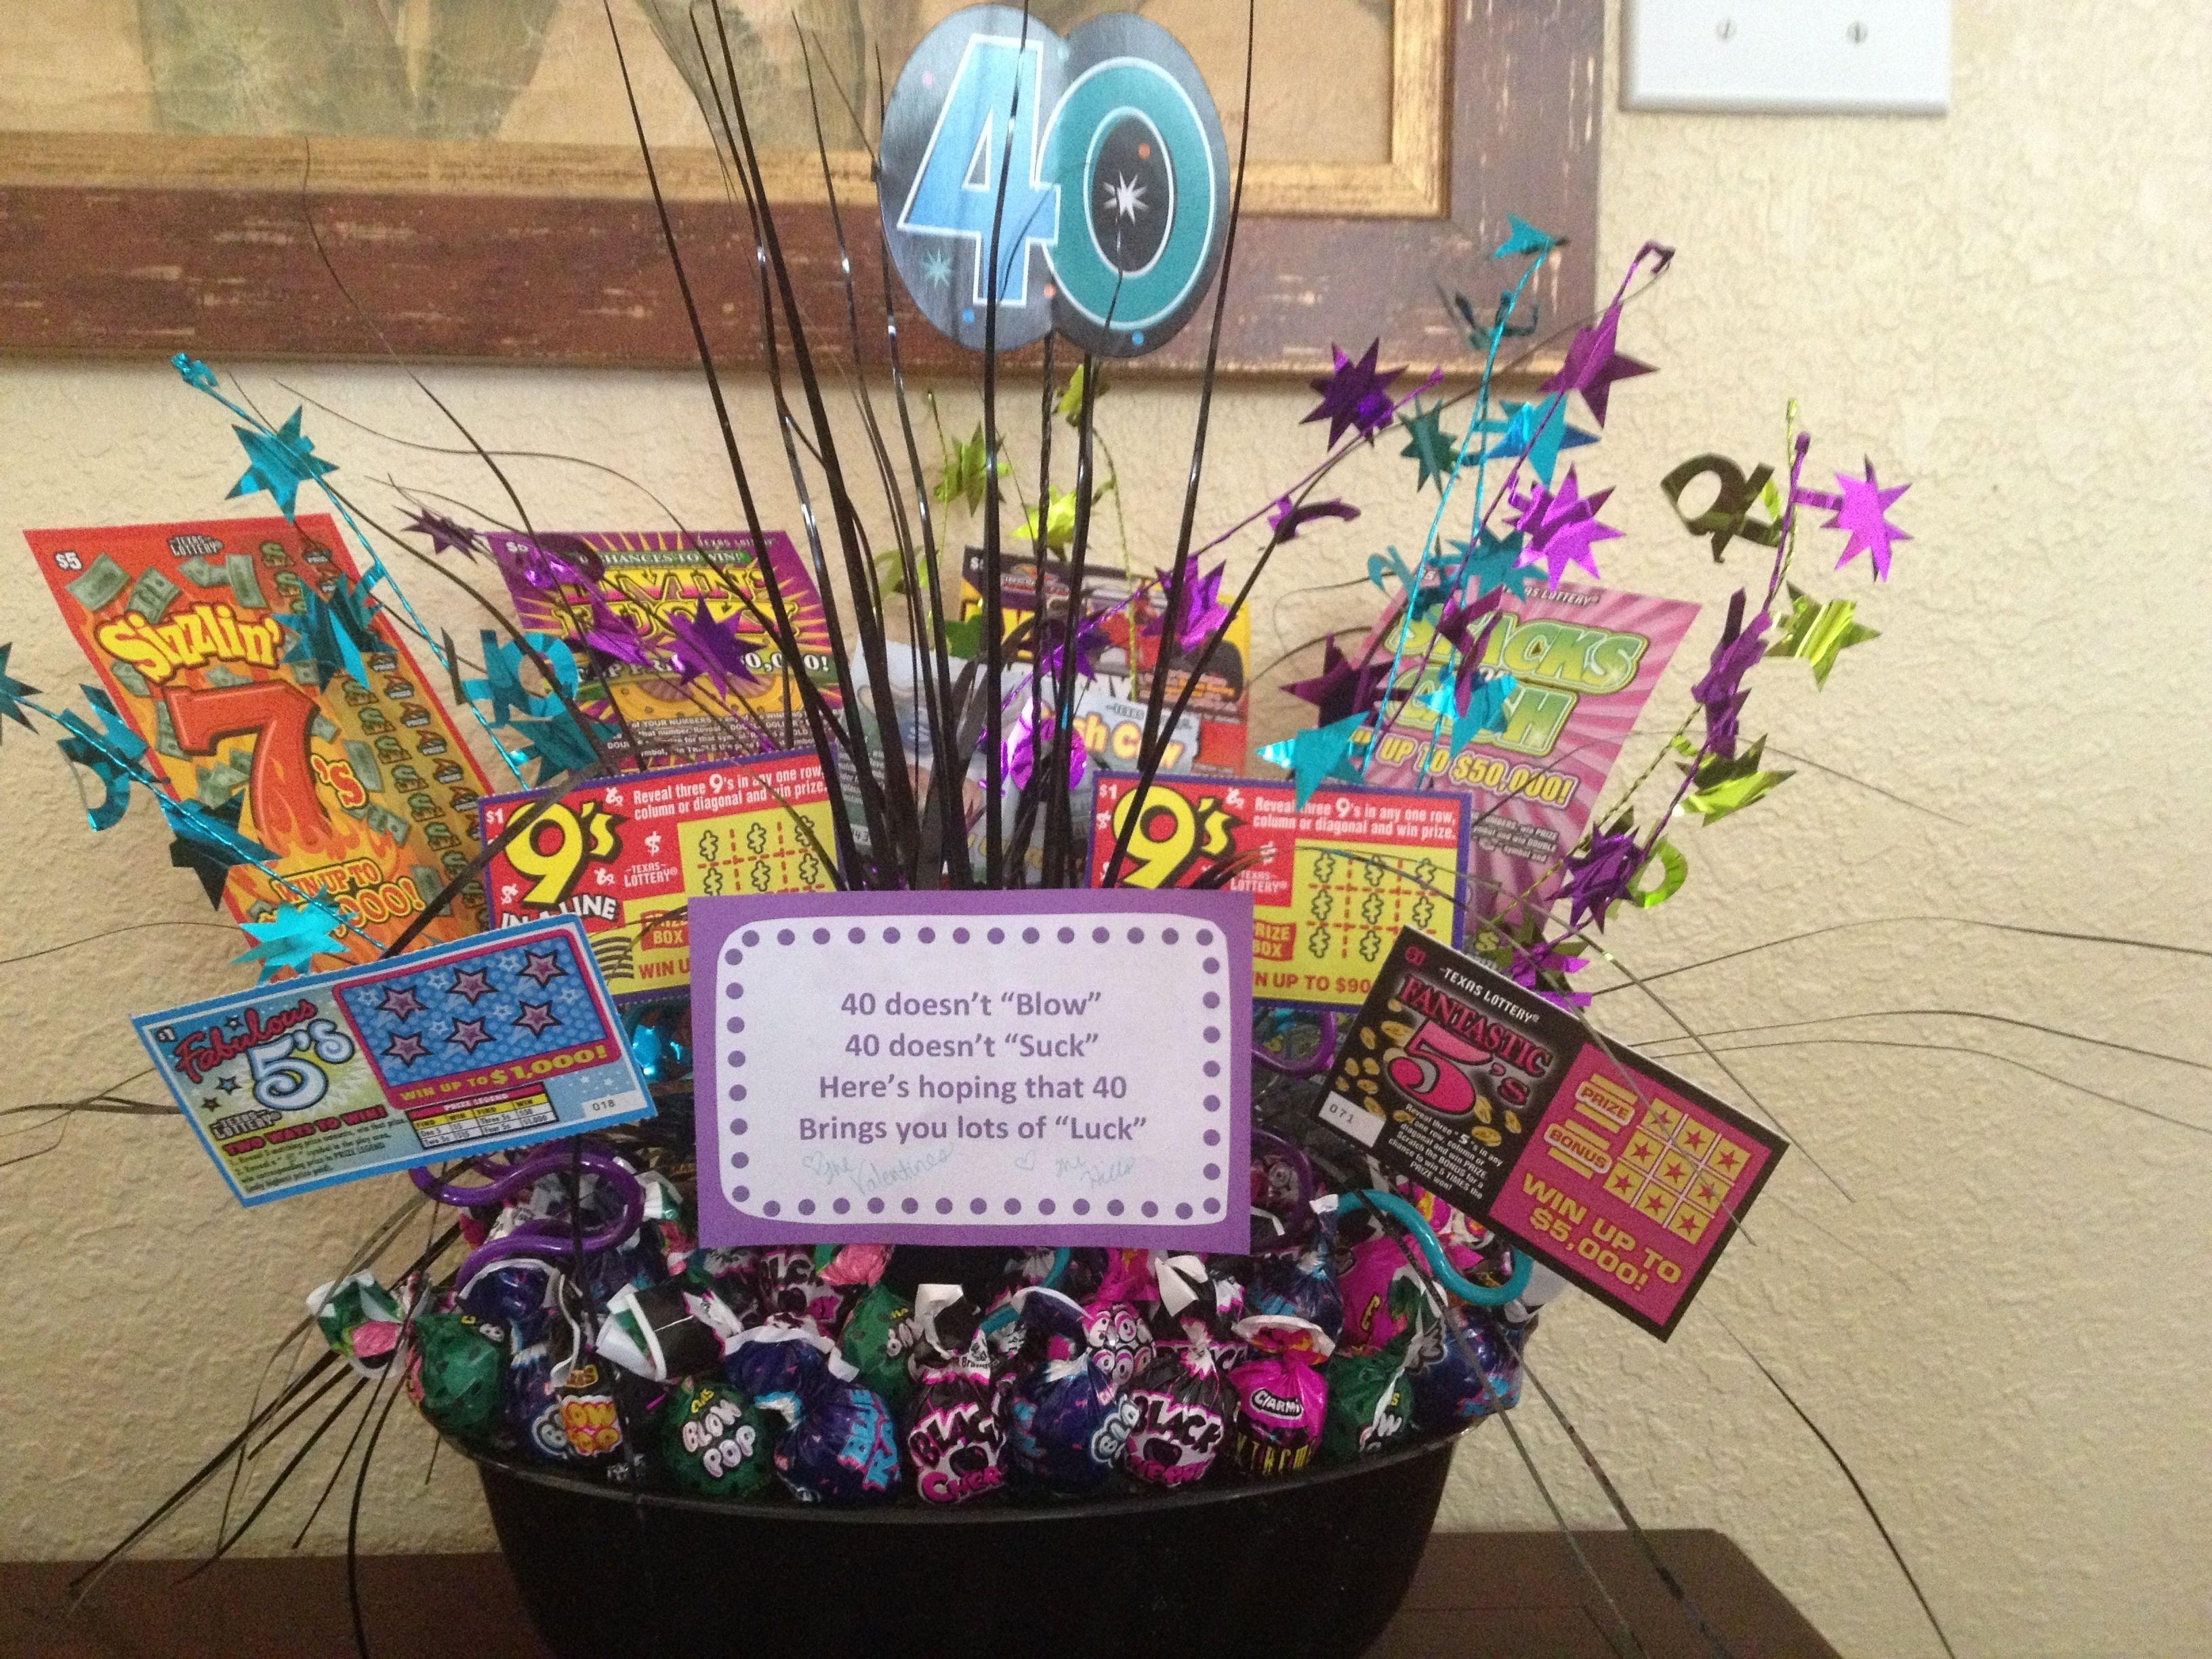 10 Most Popular Birthday Ideas For Wife Turning 40 40th birthday gift idea crafty pinterest 40 birthday birthday 8 2020